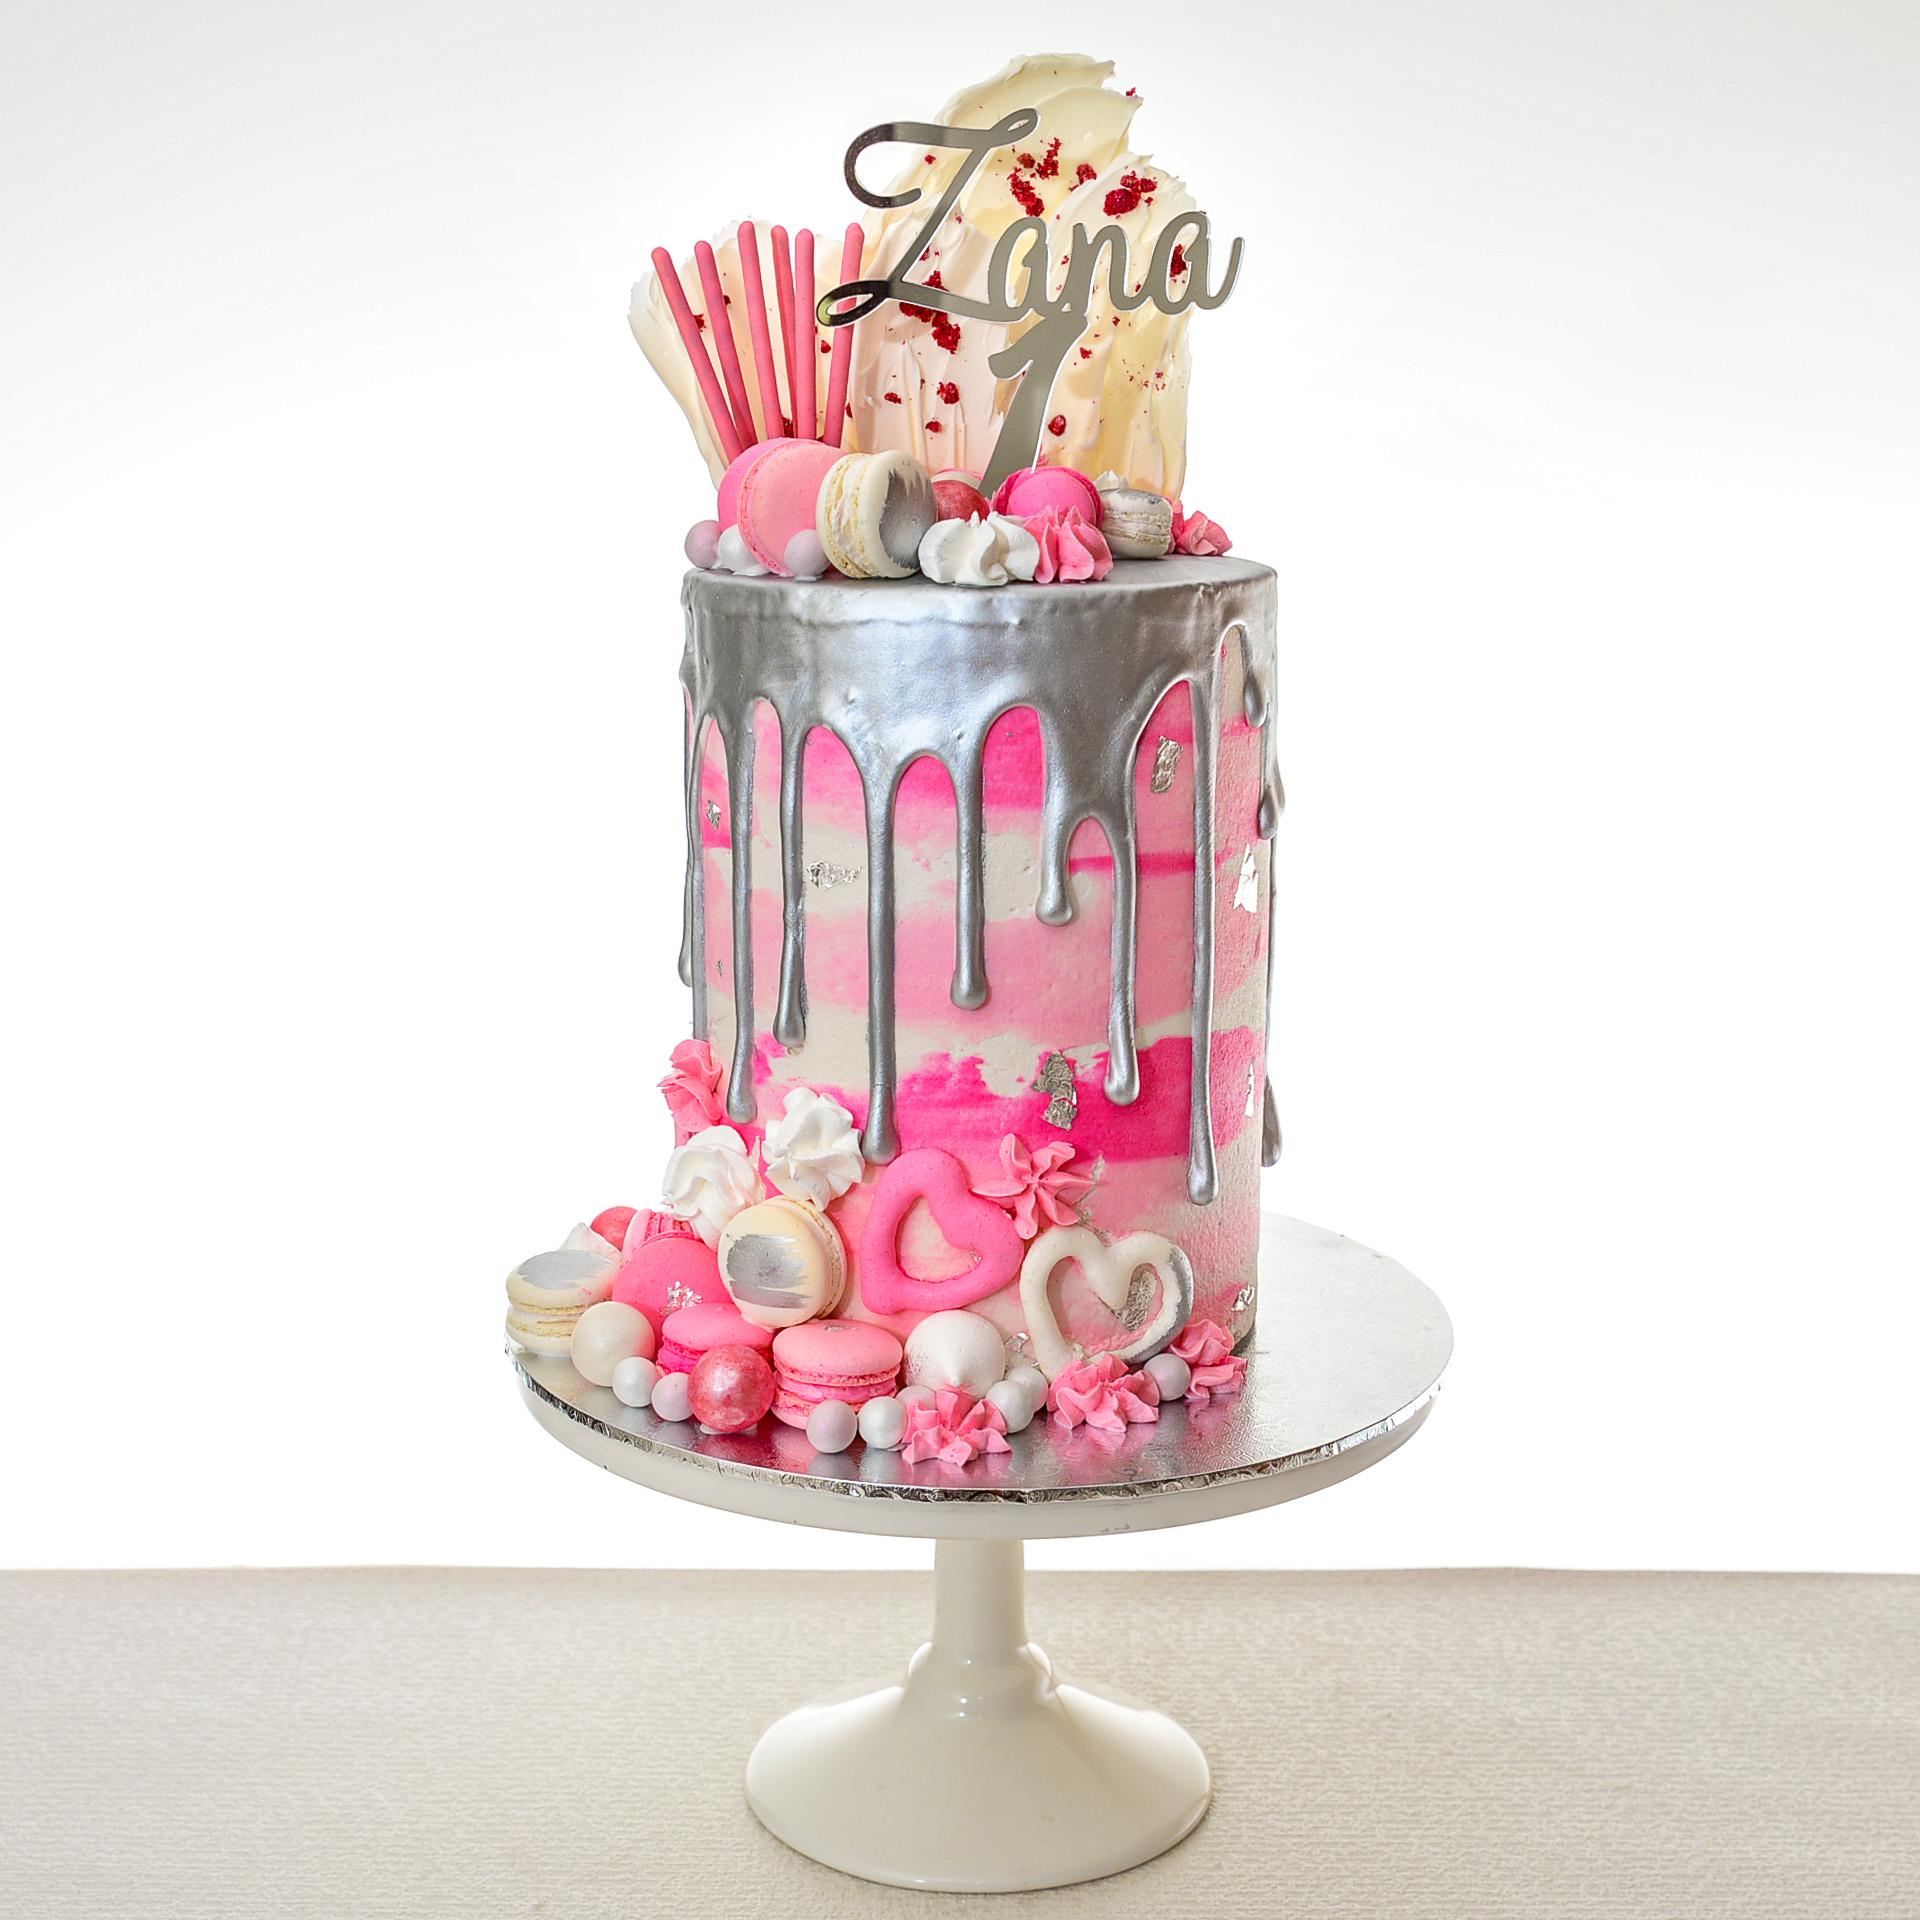 Fully-Loaded-Pink-Butter-Cream-Naked-Drip-Cake.jpg